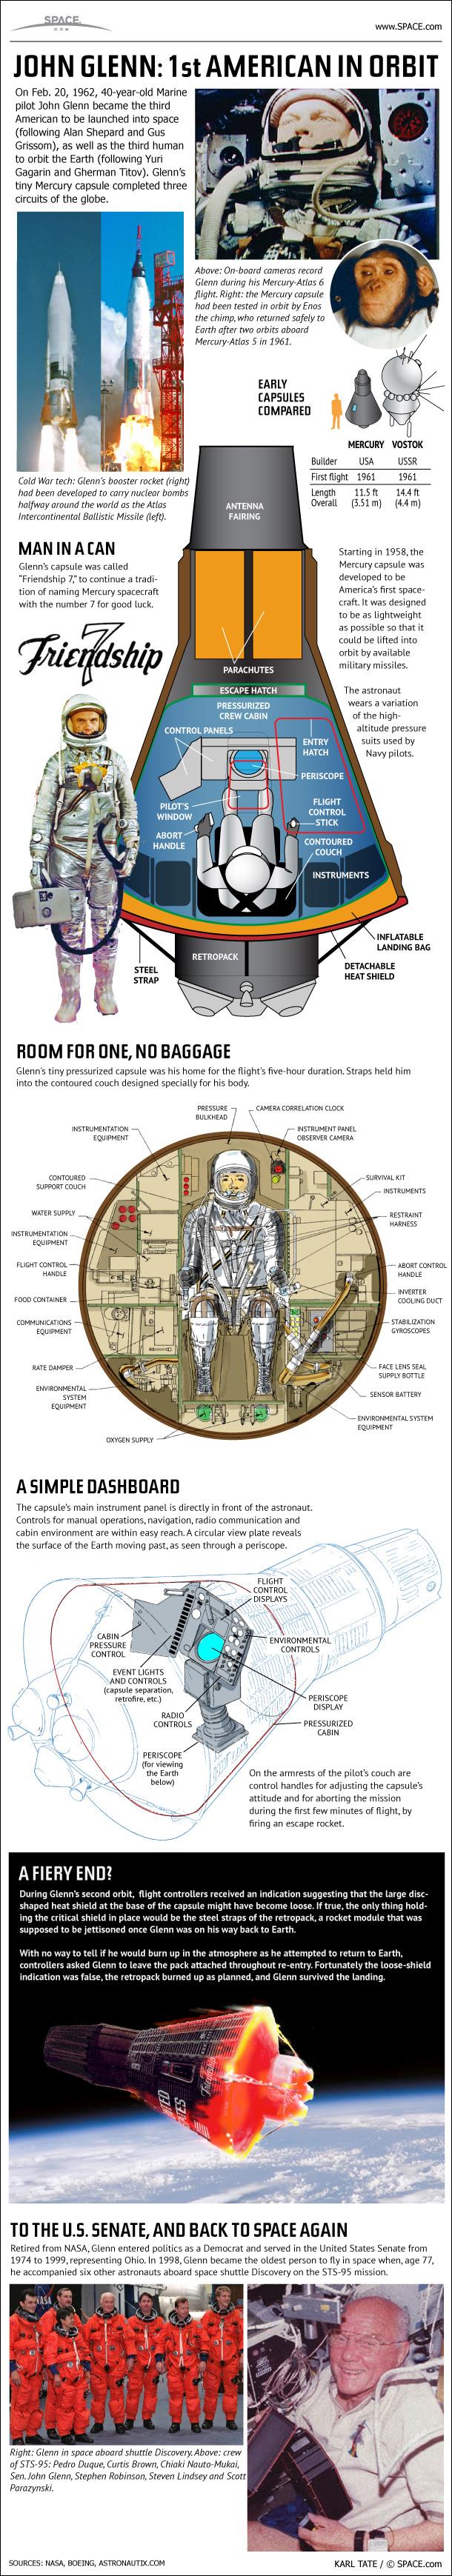 1st American in Orbit: How John Glenn (And NASA) Made History (Infographic)